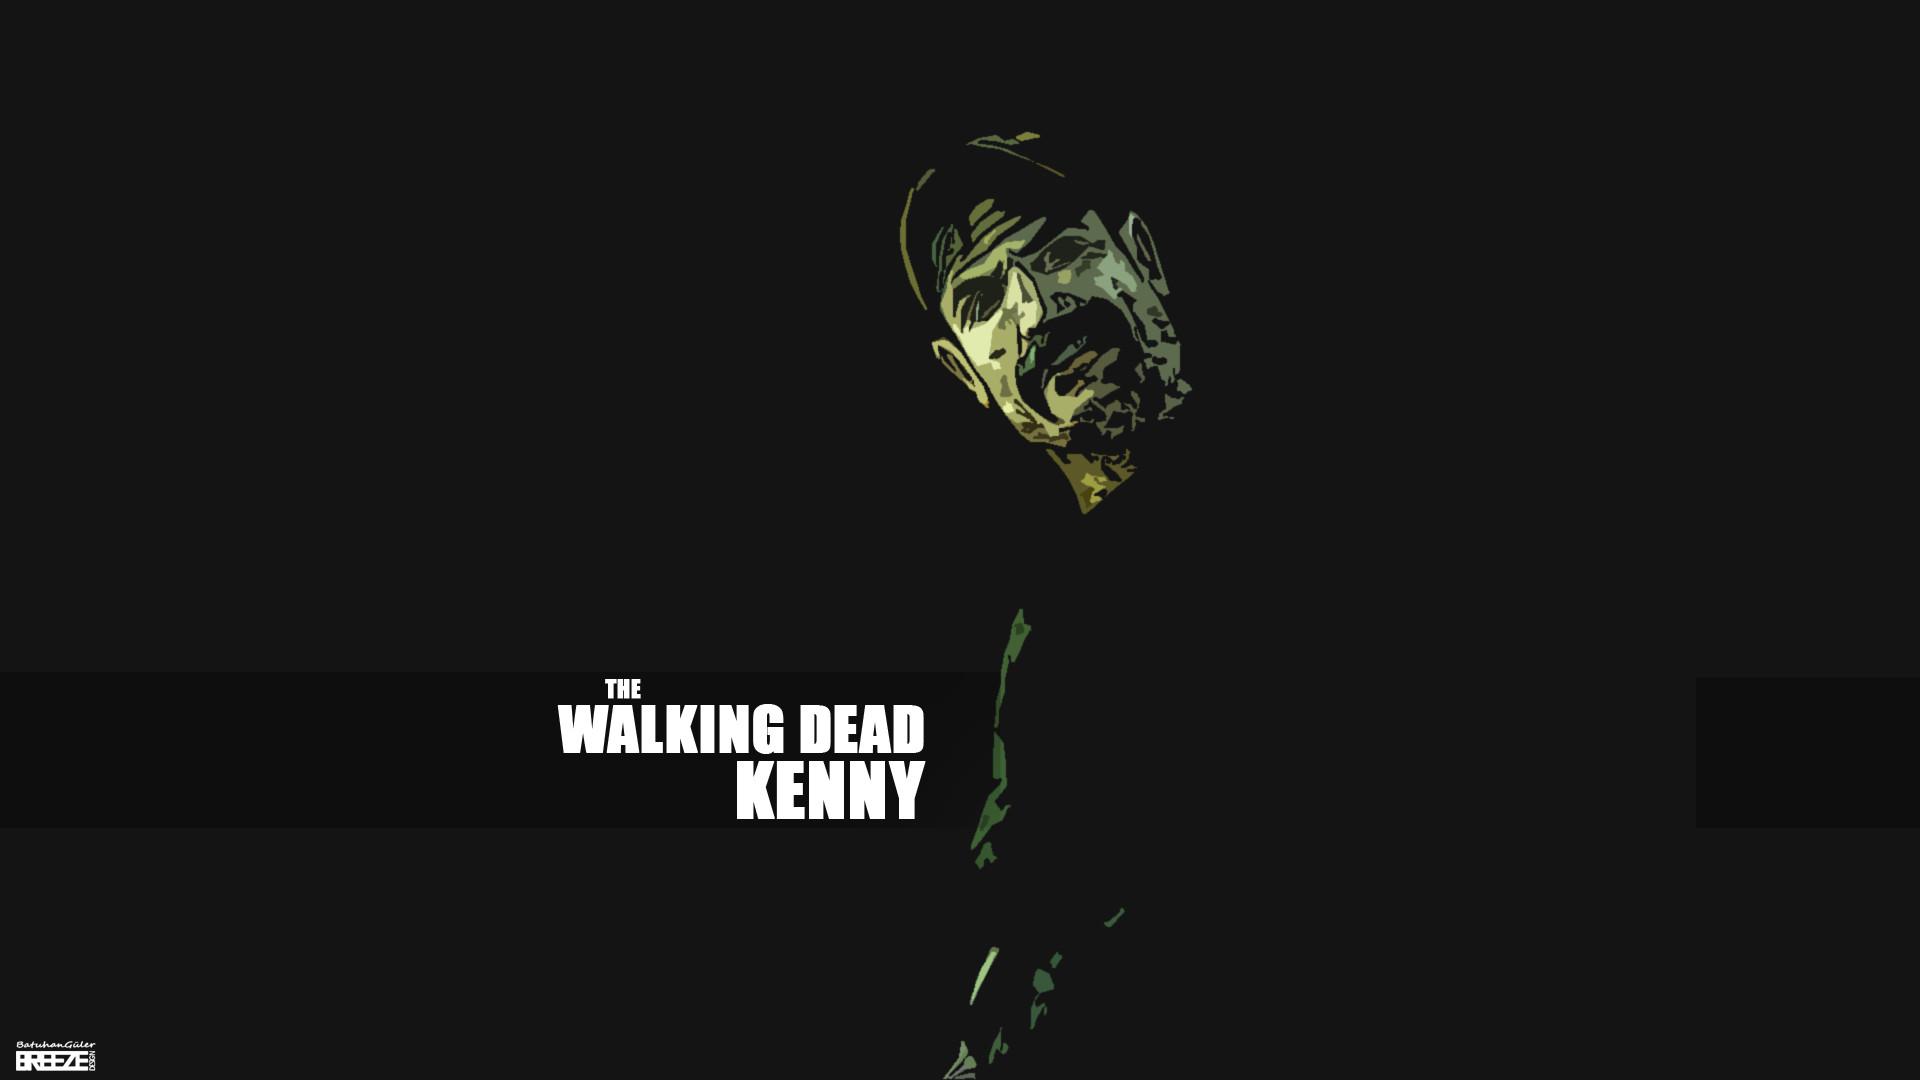 … The Walking Dead Kenny – Wallpaper by Syrastra